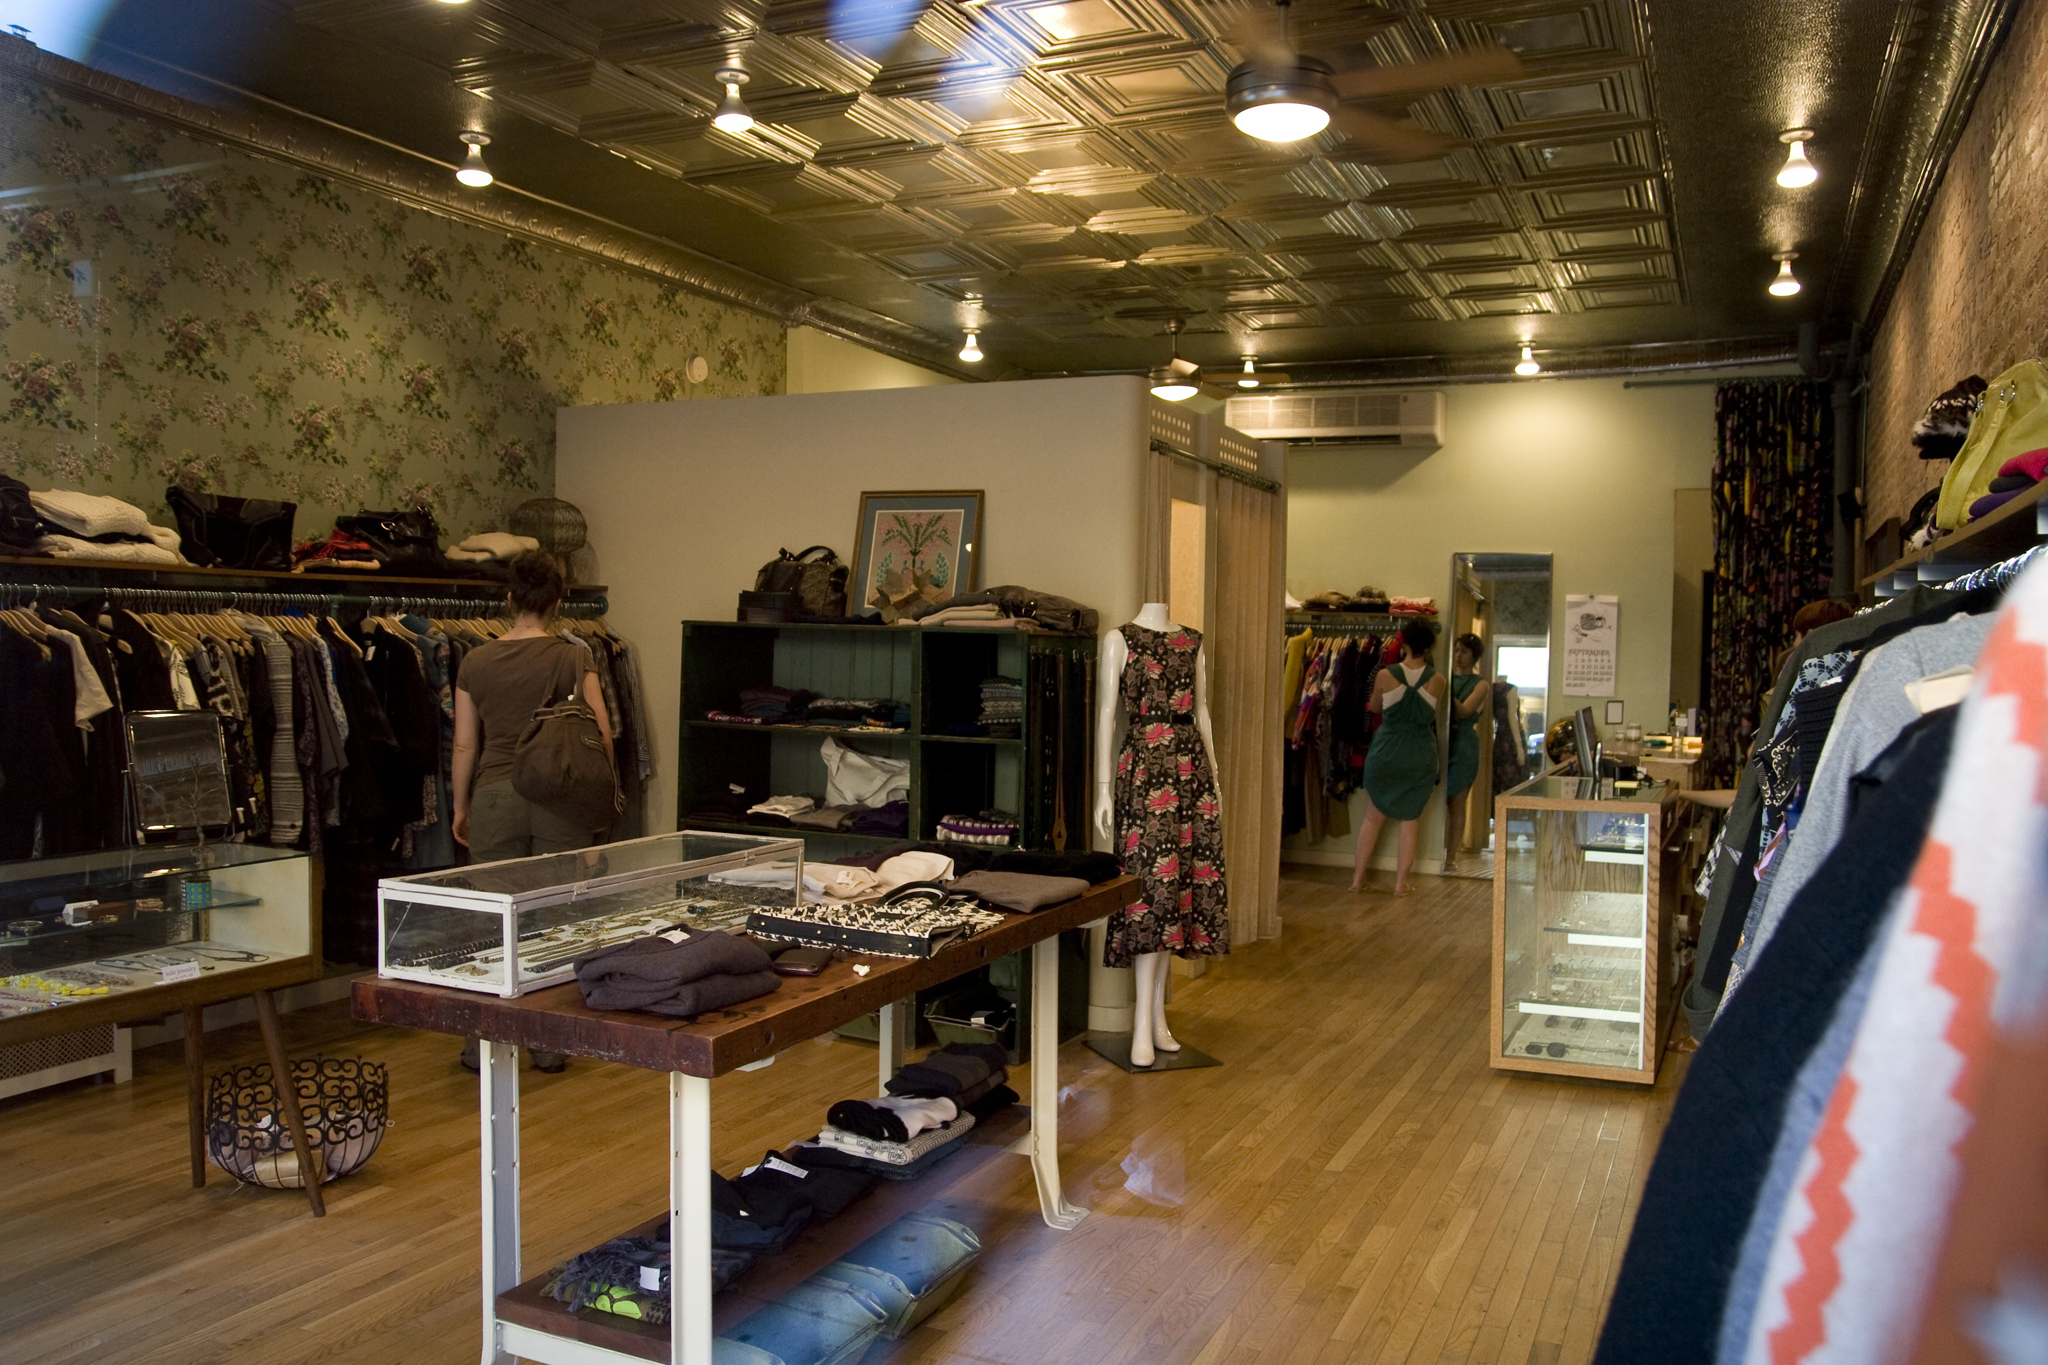 Kools Clothing Store - Los Angeles, CA, United States